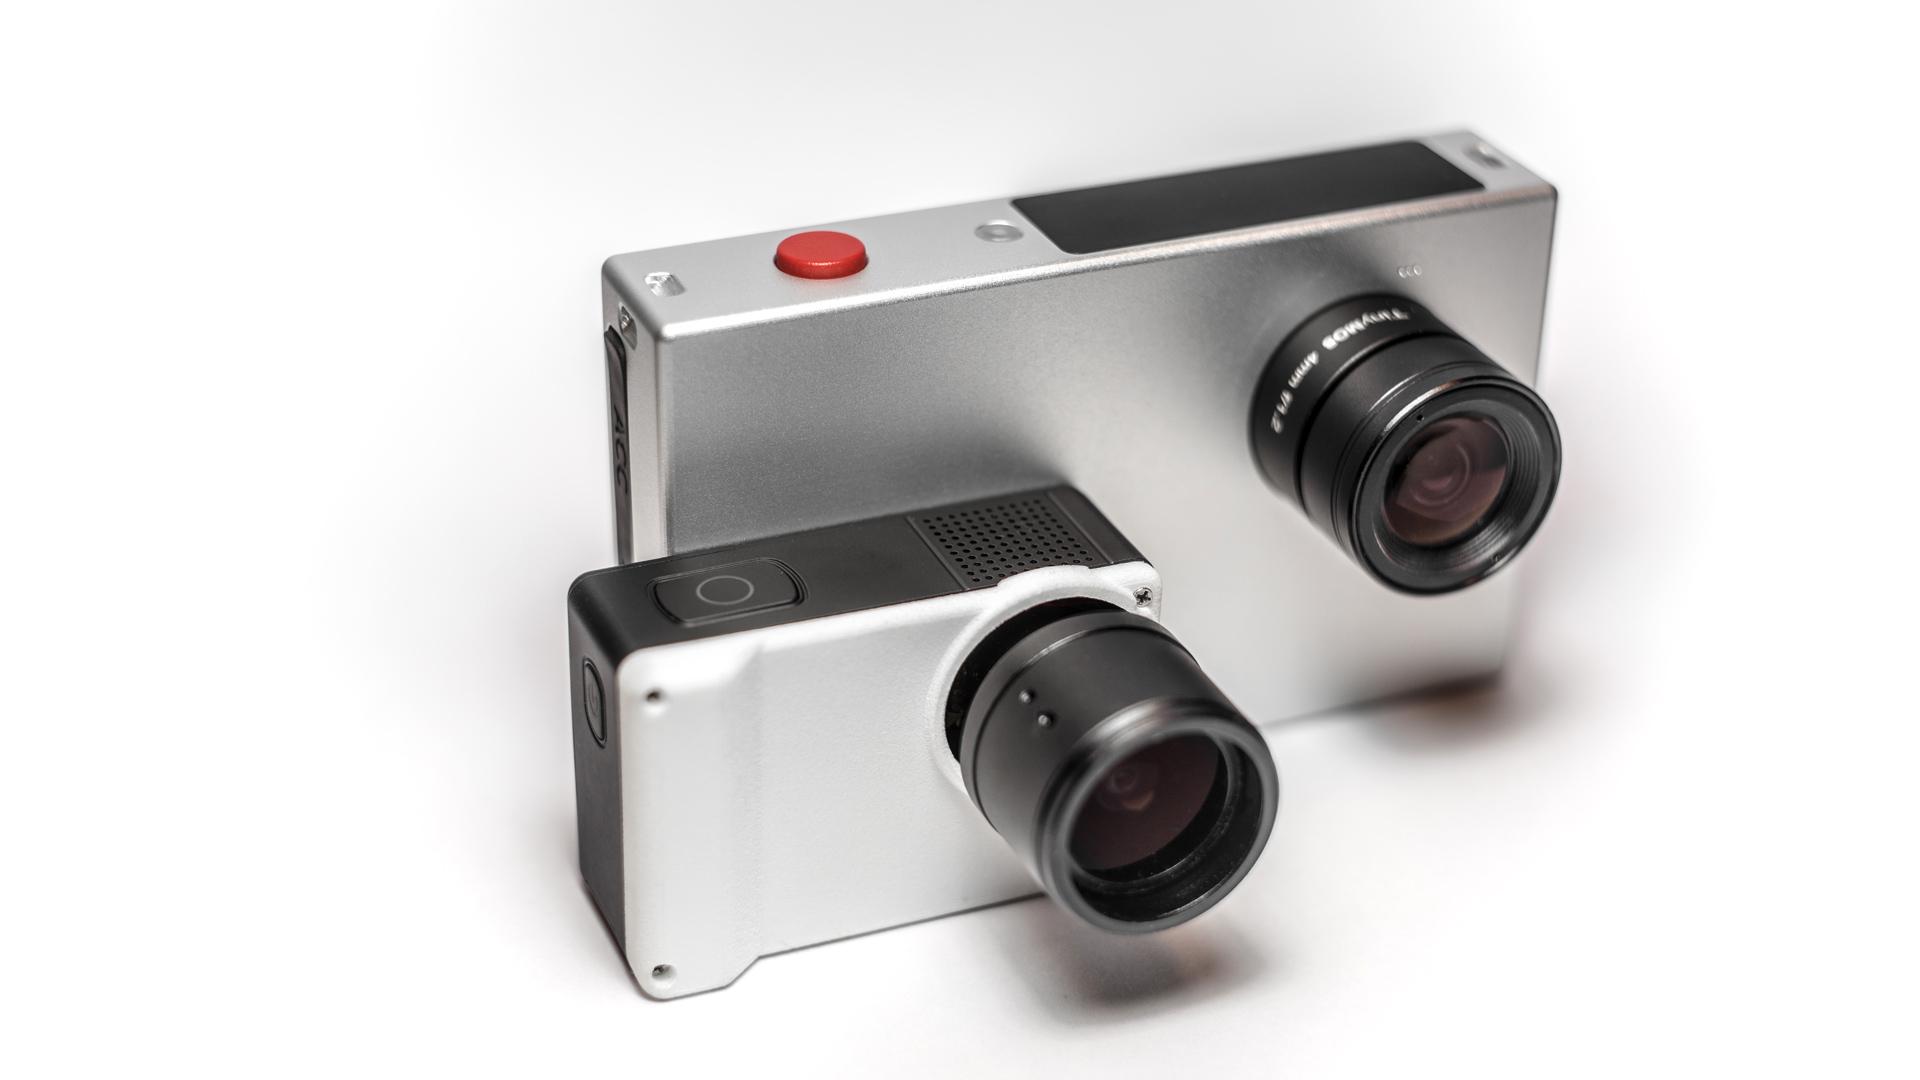 Color Astronomy Camera CMOS Compact Wide-angle Lens for Guiding Star